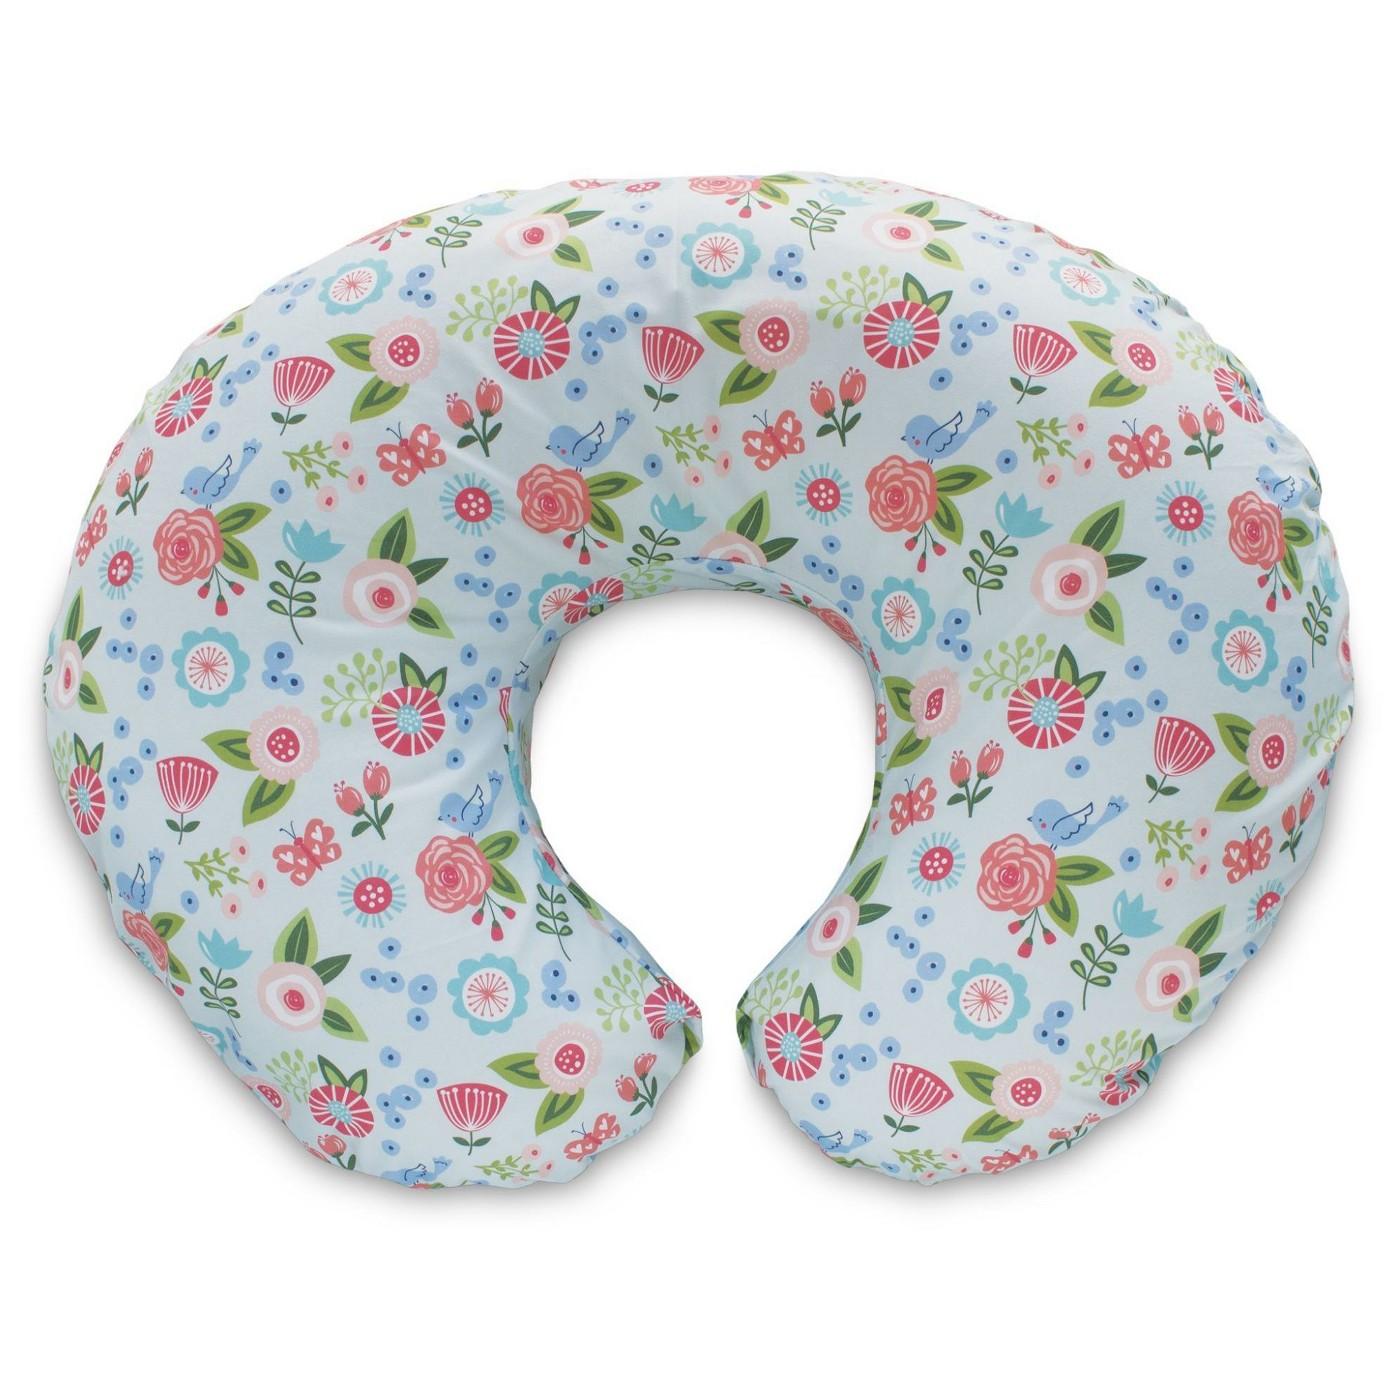 Classic Slipcover - Fresh Flowers - $9.99